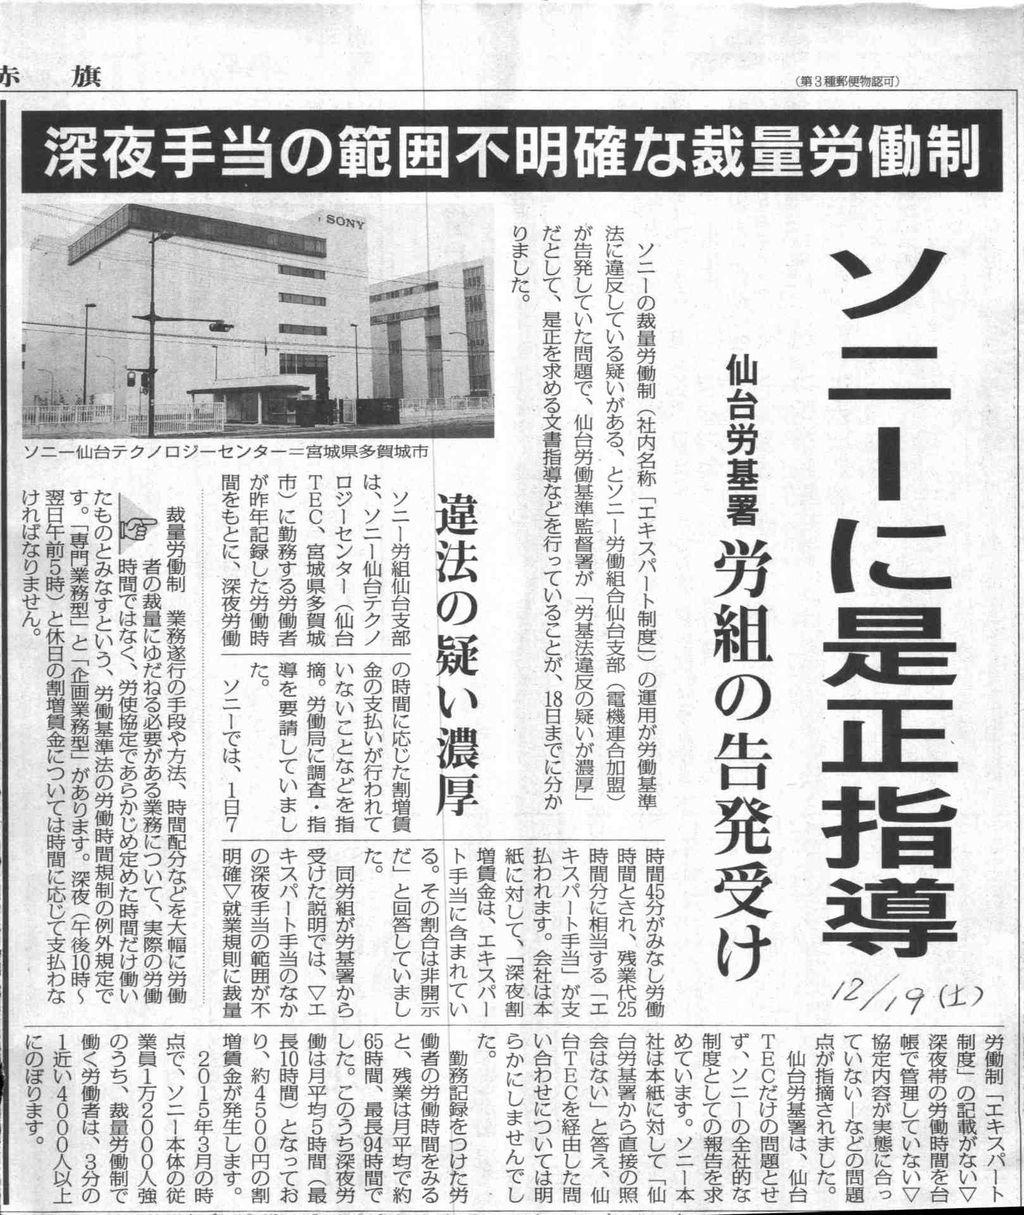 裁量労働制、仙台労基署がソニーに是正指導!